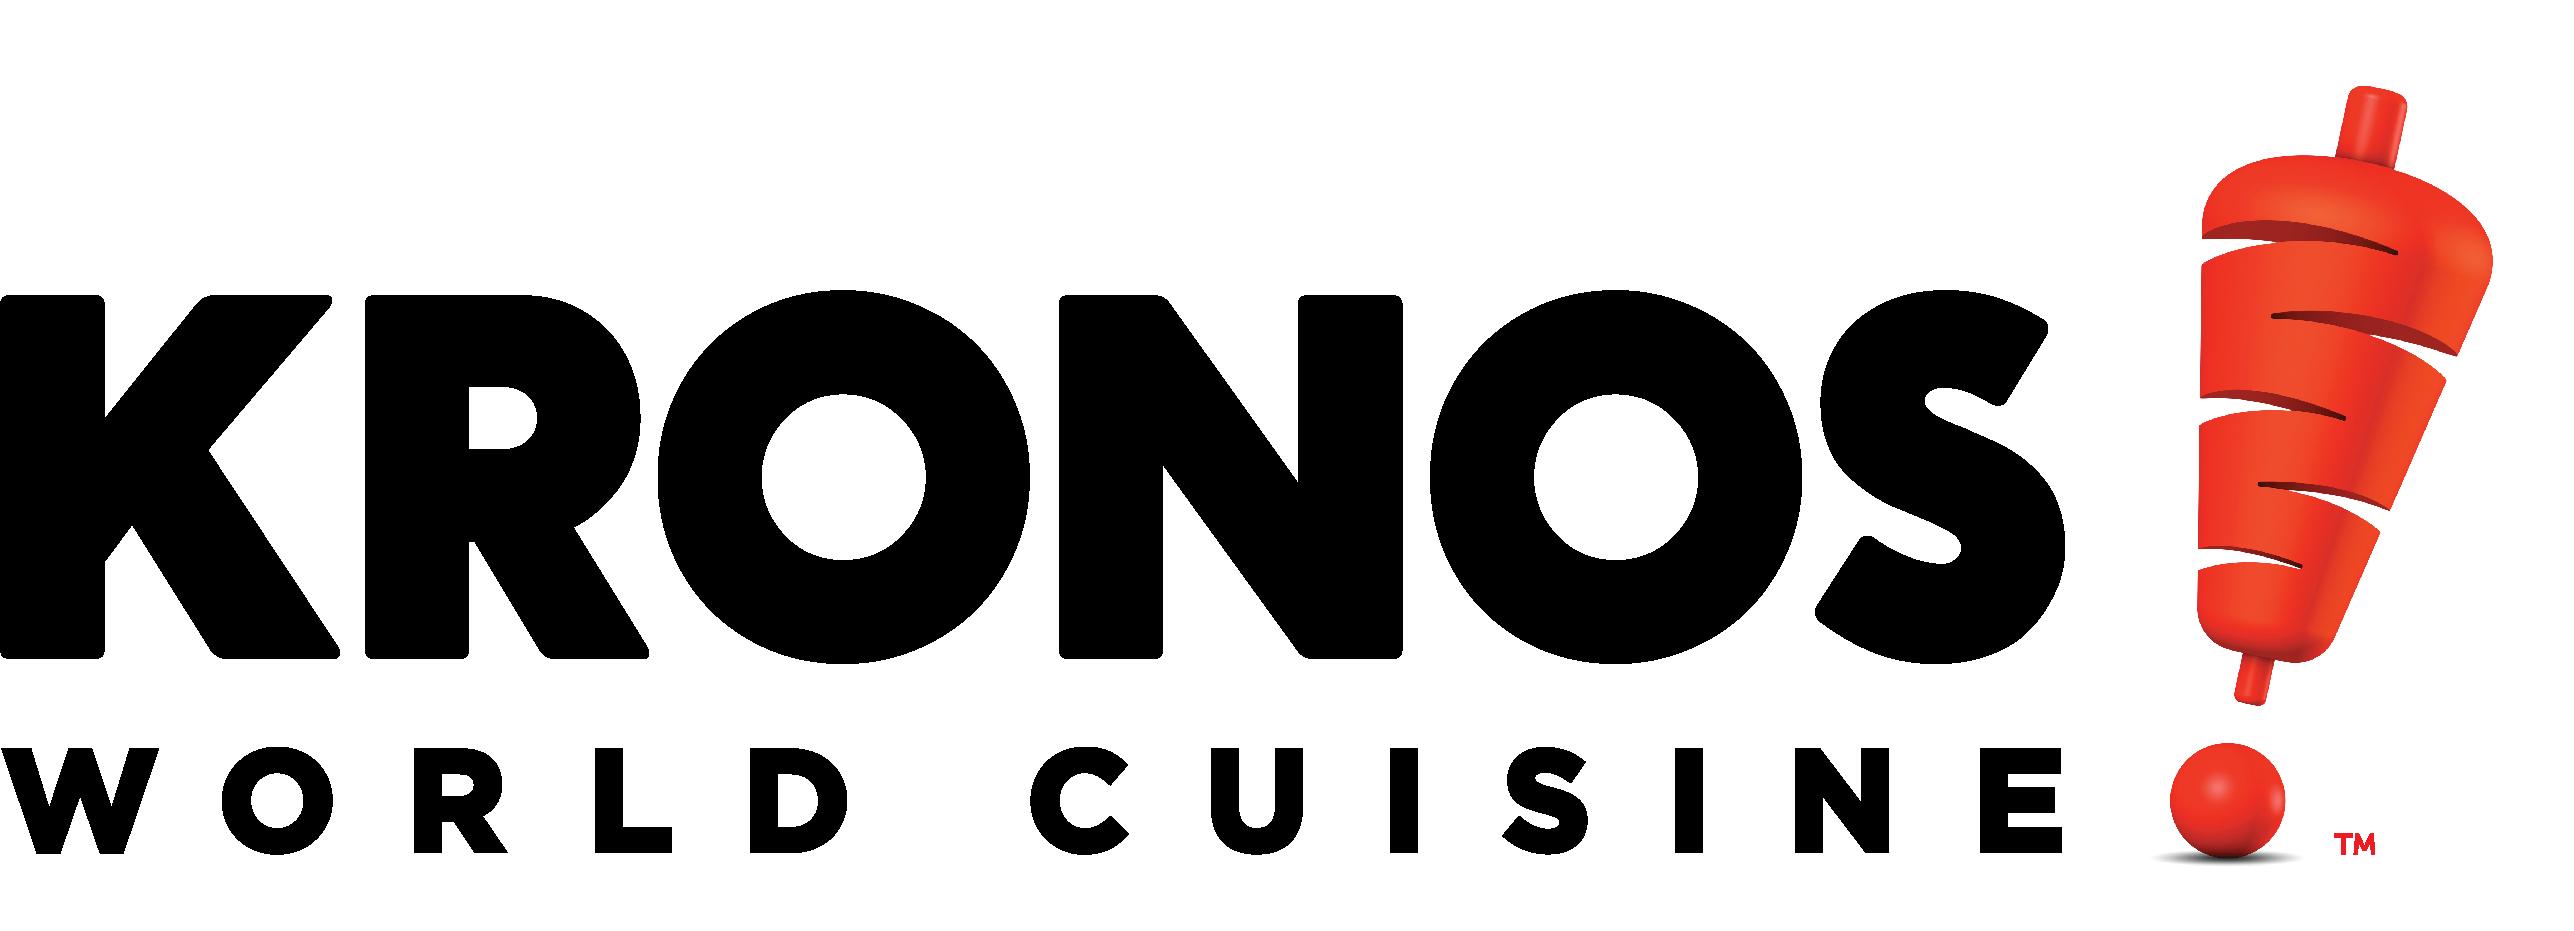 Kronos Foods